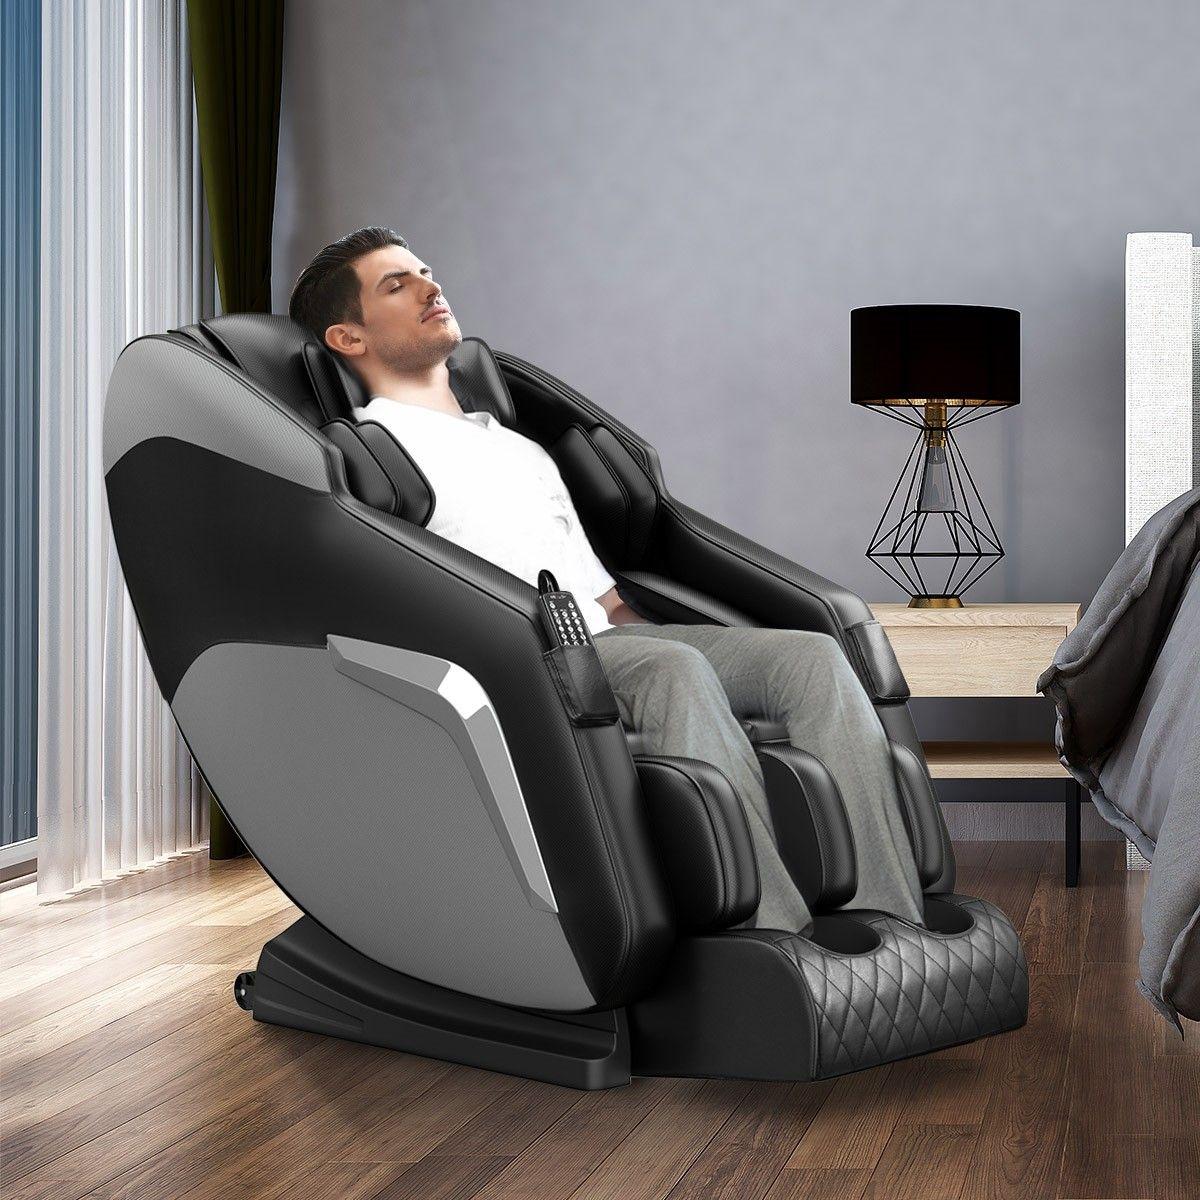 HOMASA Black Full body Massage Chair Zero Gravity Recliner ...